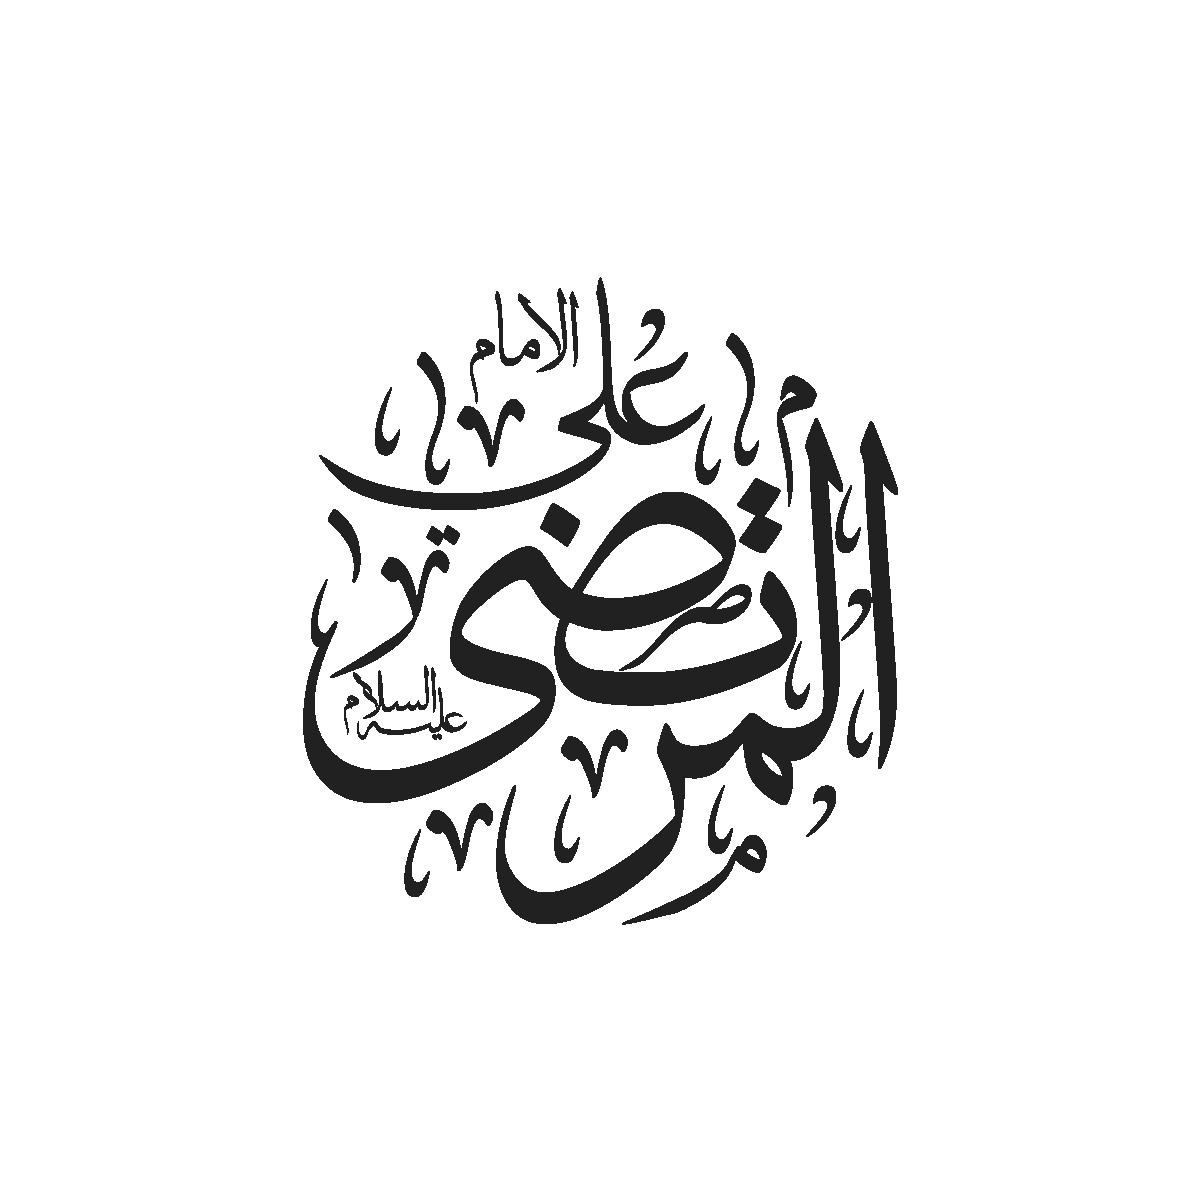 flatdesign logo color png imams black whiteislamic